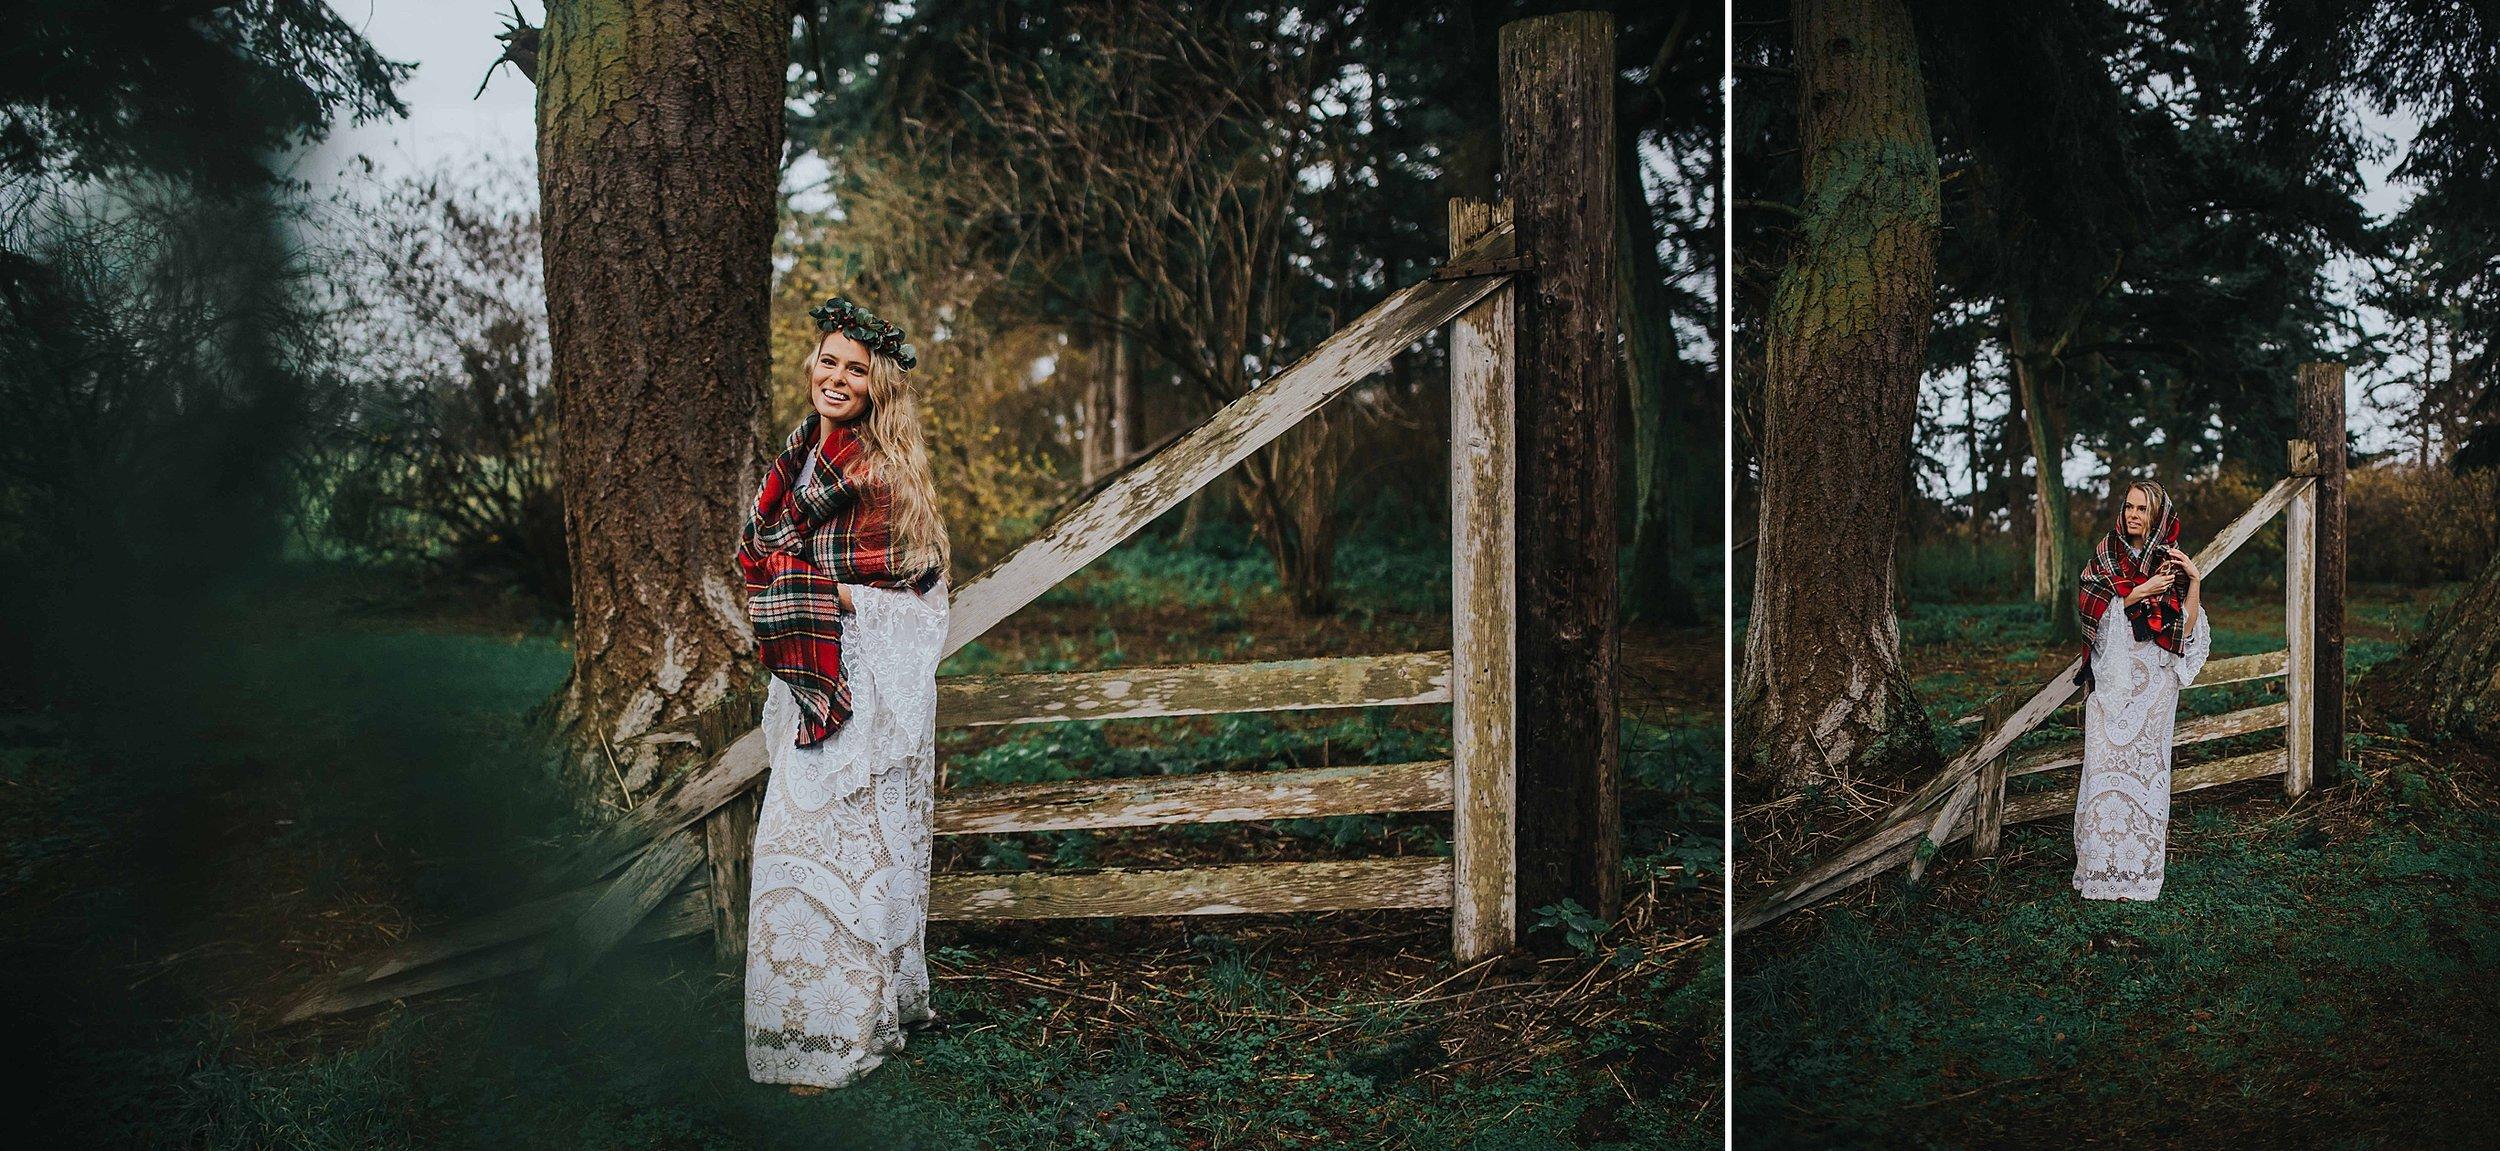 Wedding-photographer-J HODGES PHOTOGRAPHY_0218.jpg